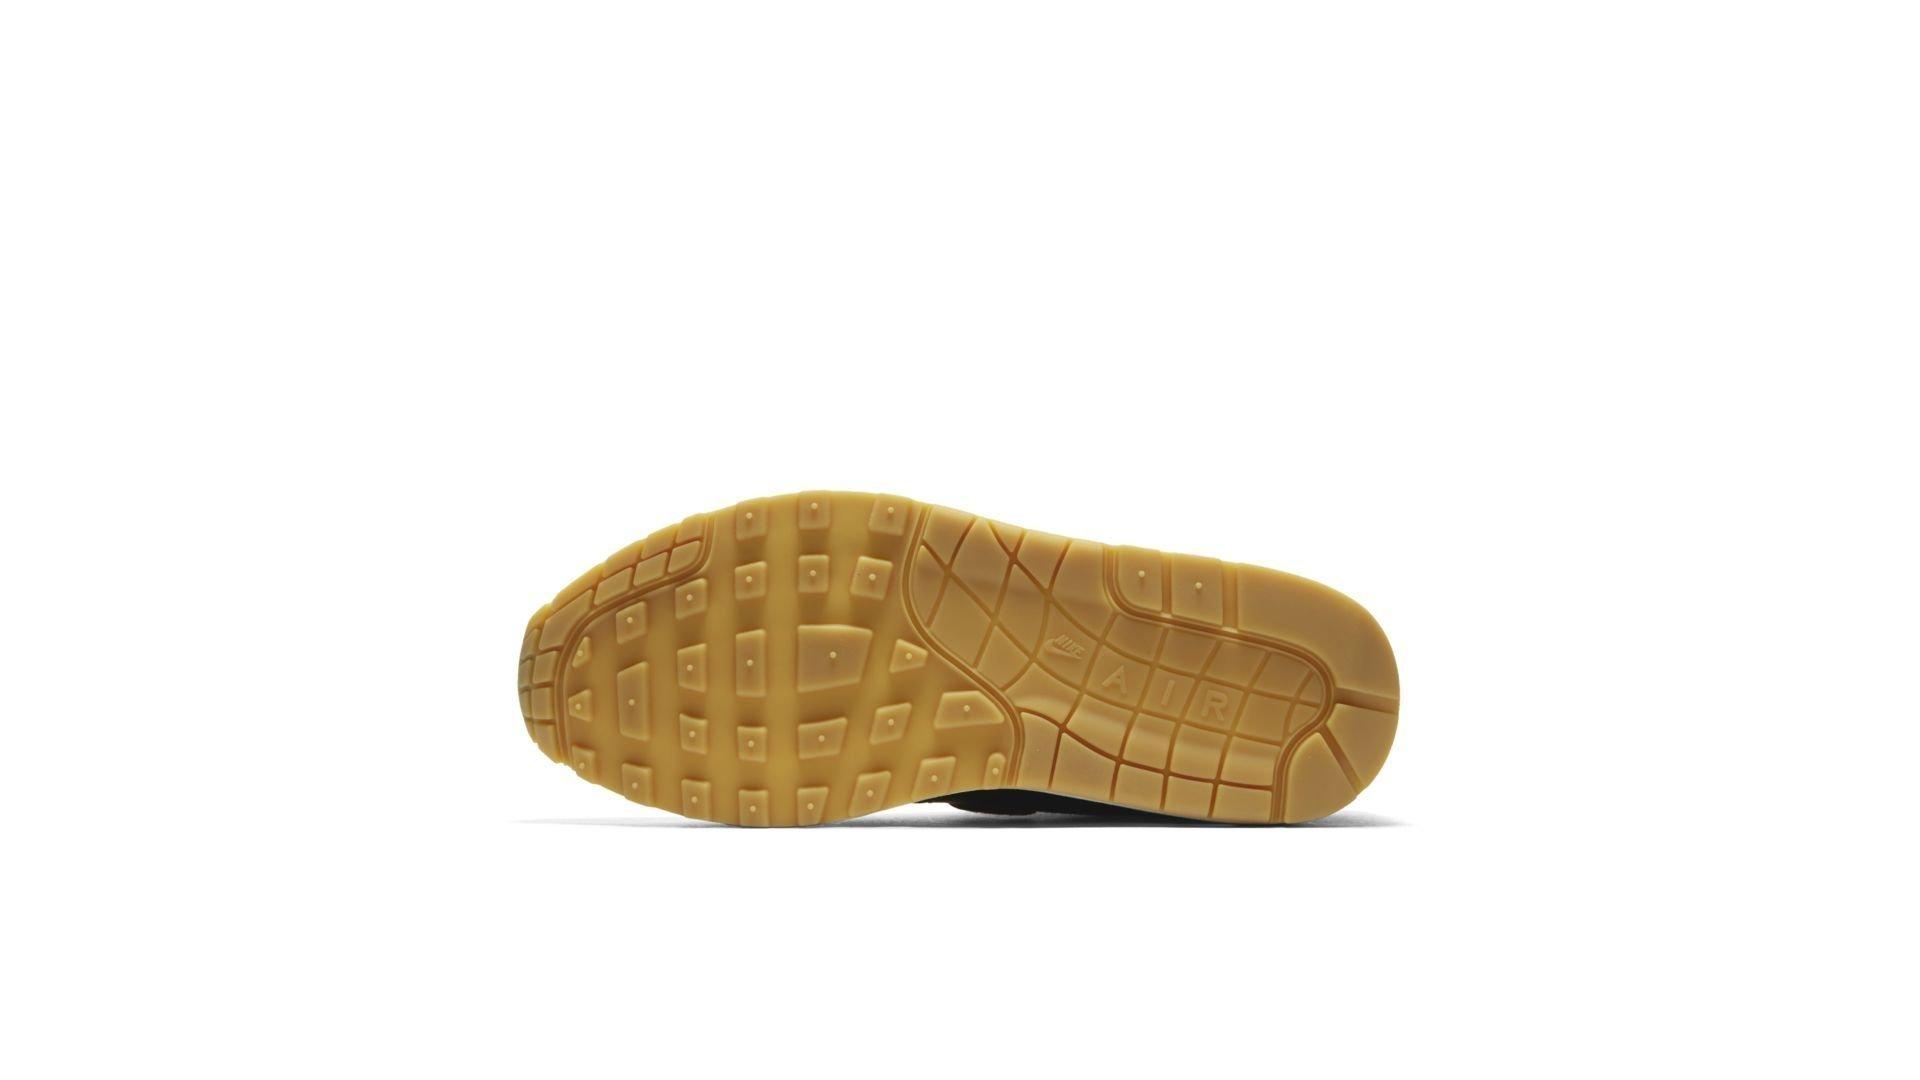 Nike Wmns Air Max 1 Premium 'Black/Gum Yellow' (454746-020)